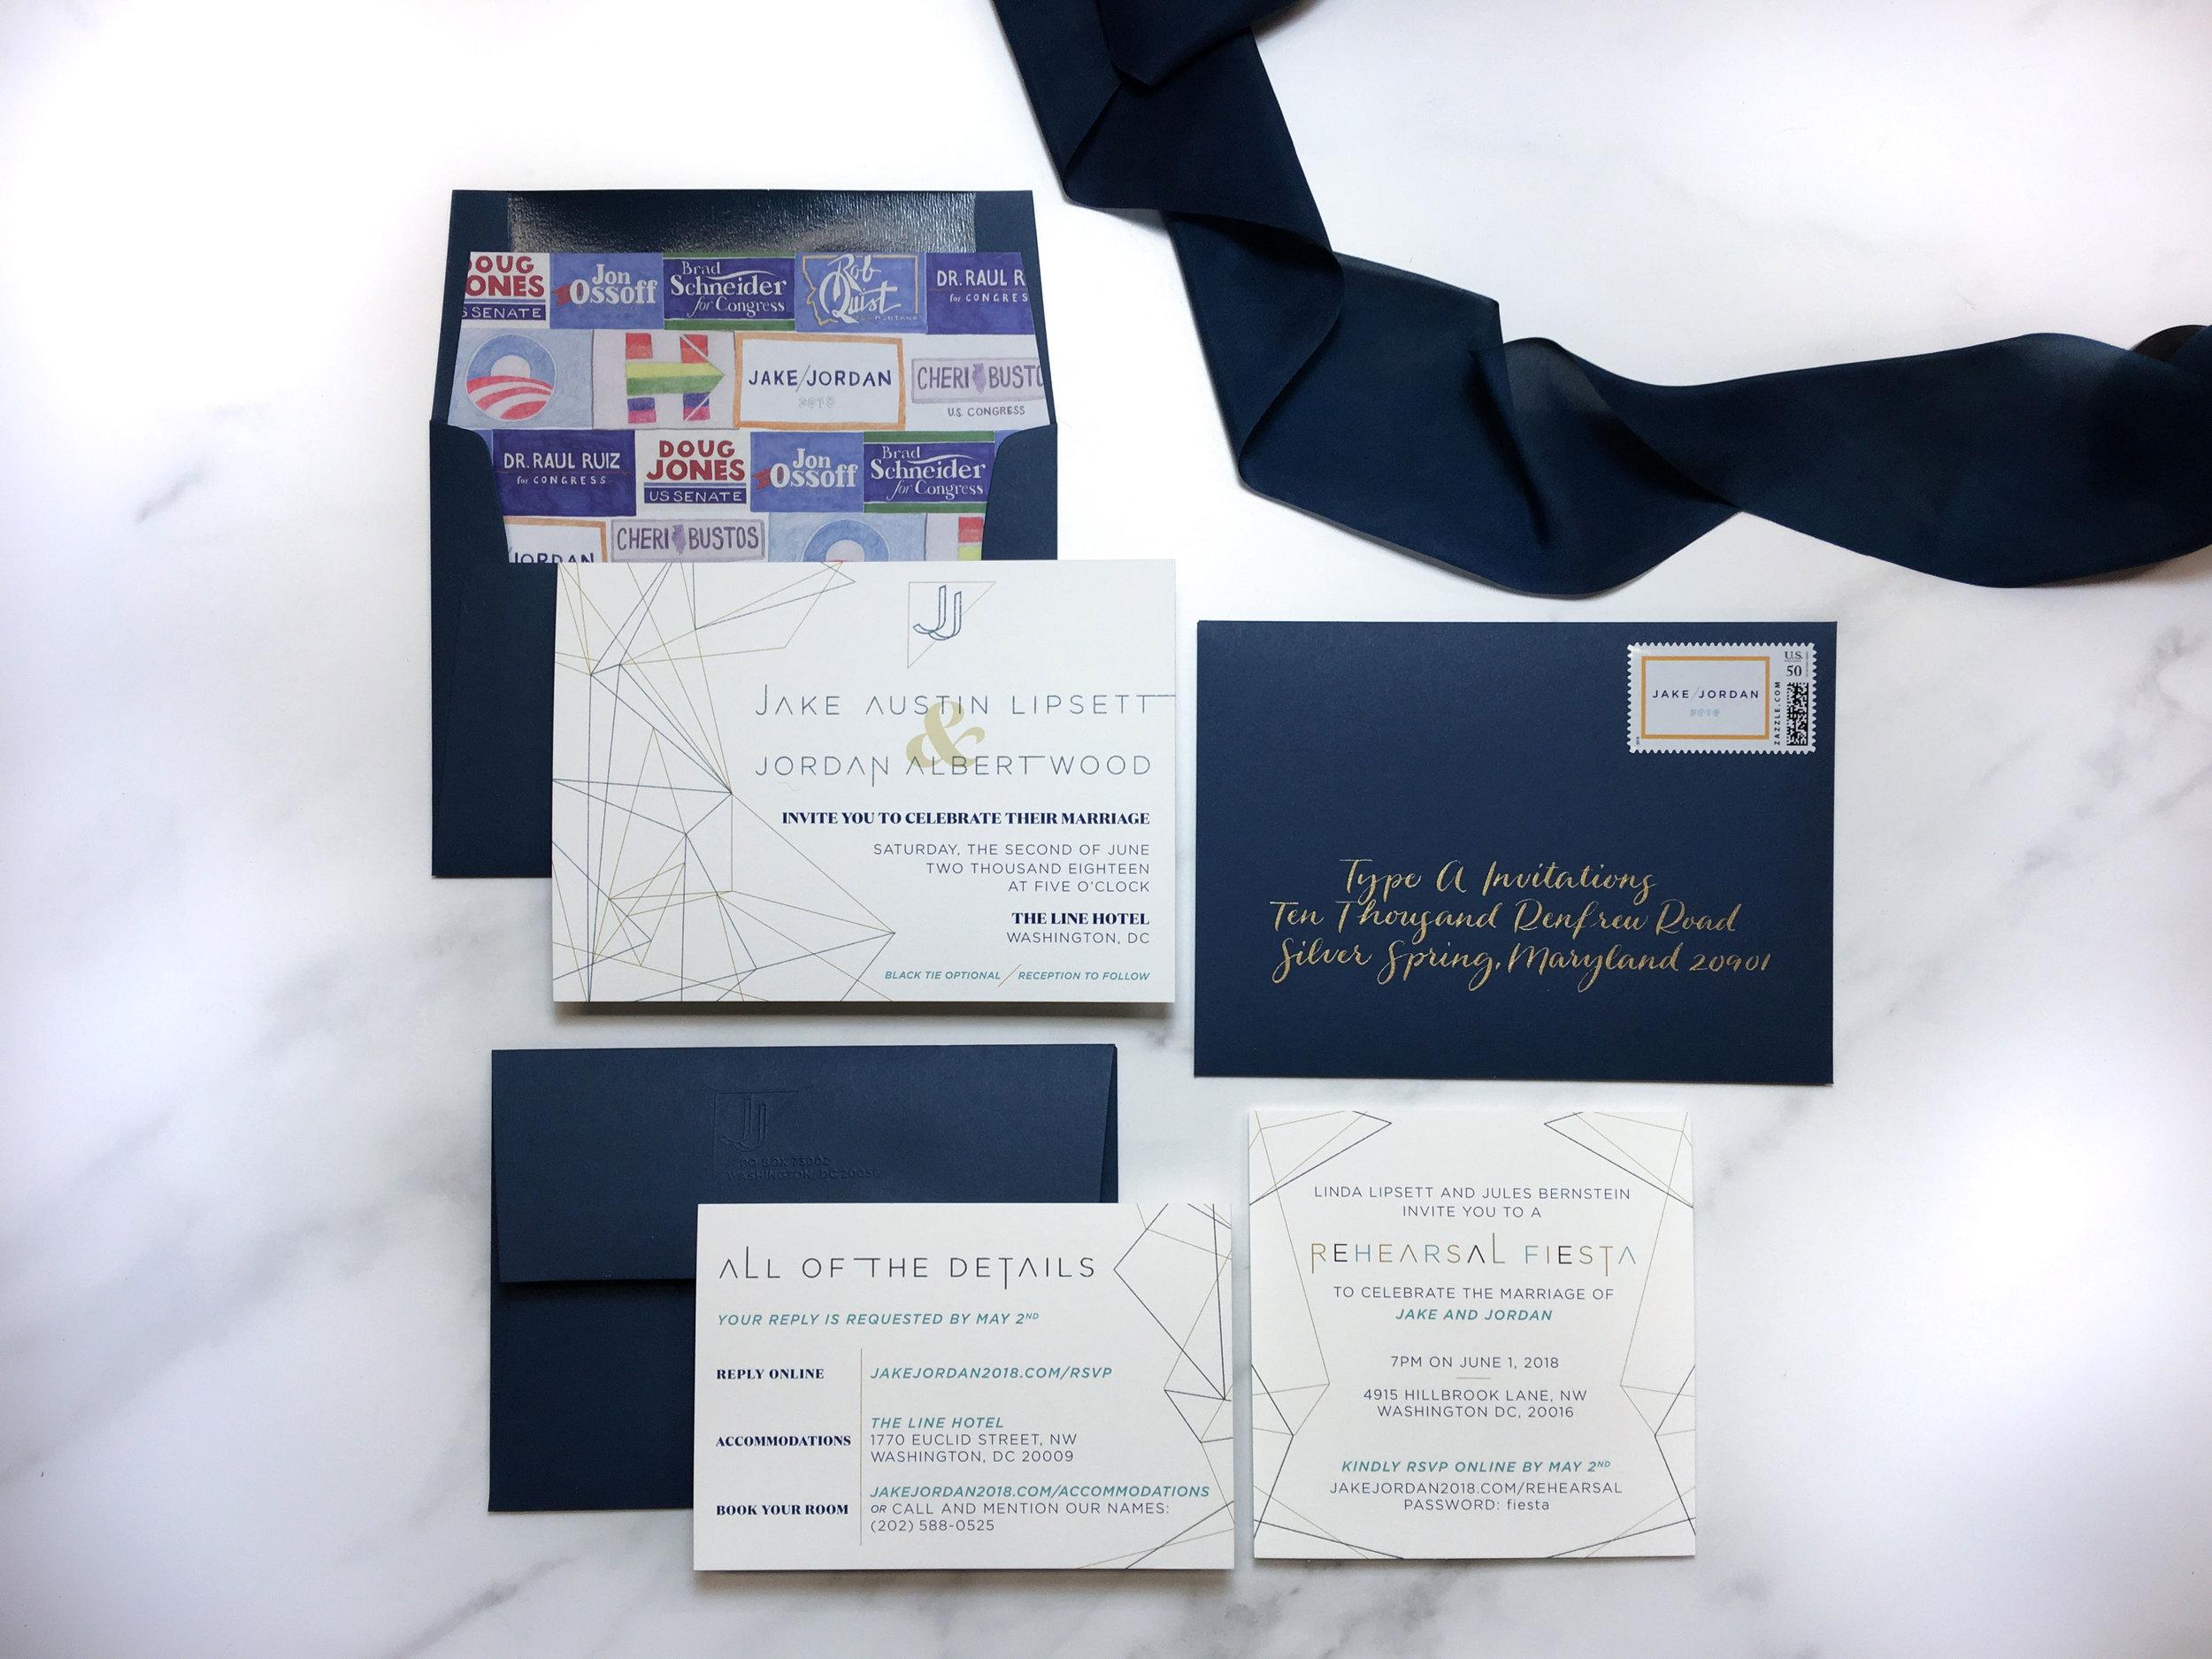 Type-A-DC-Same-Sex-Wedding-Invitations-Modern-IMG_7273.jpg